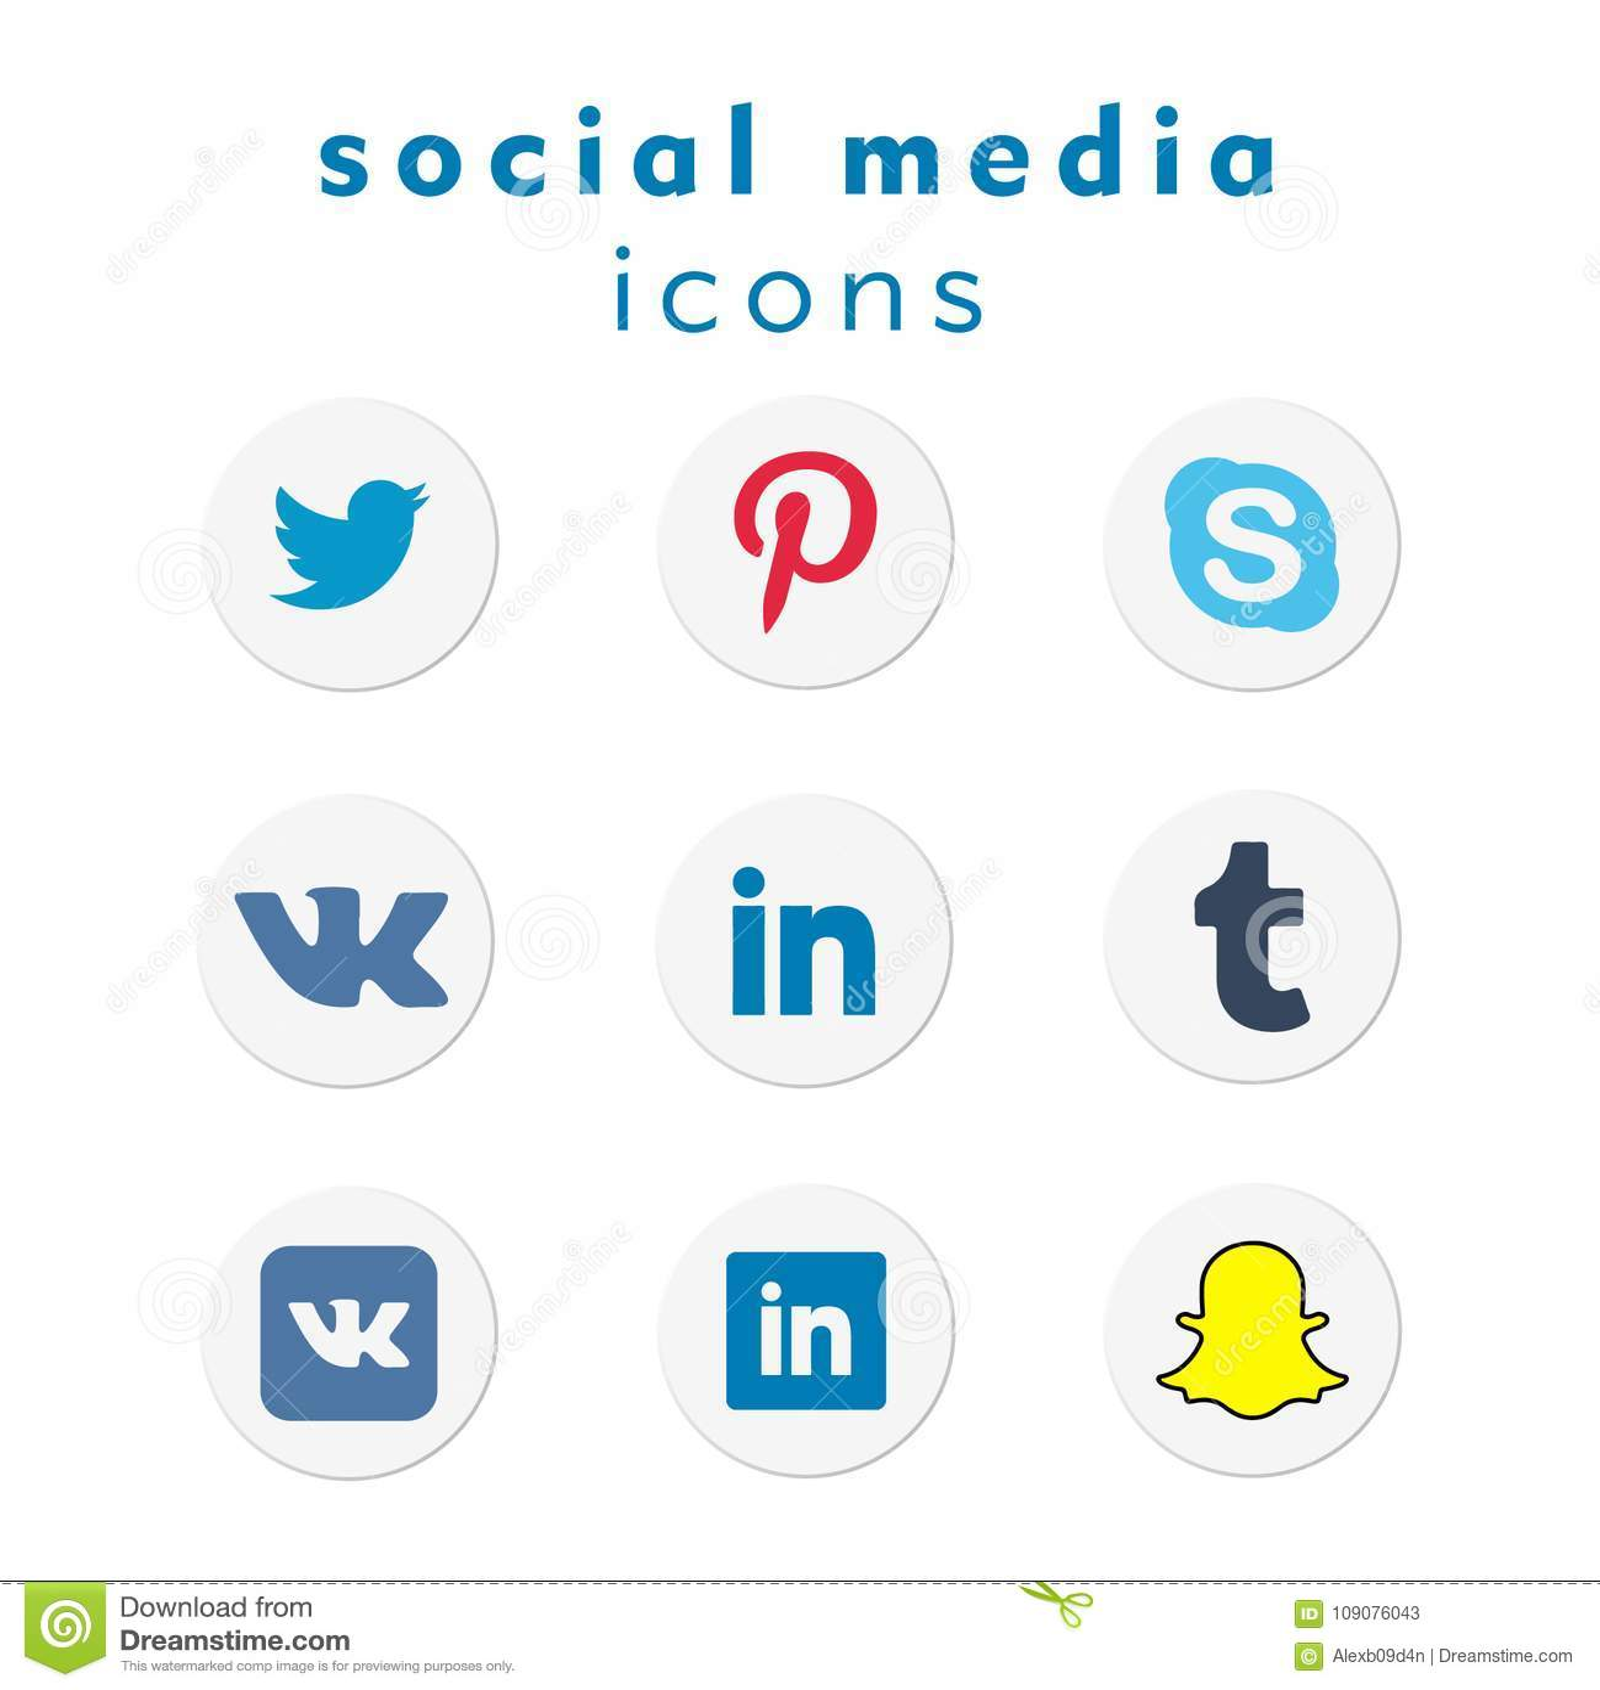 9 new logo-icons social media (vector)